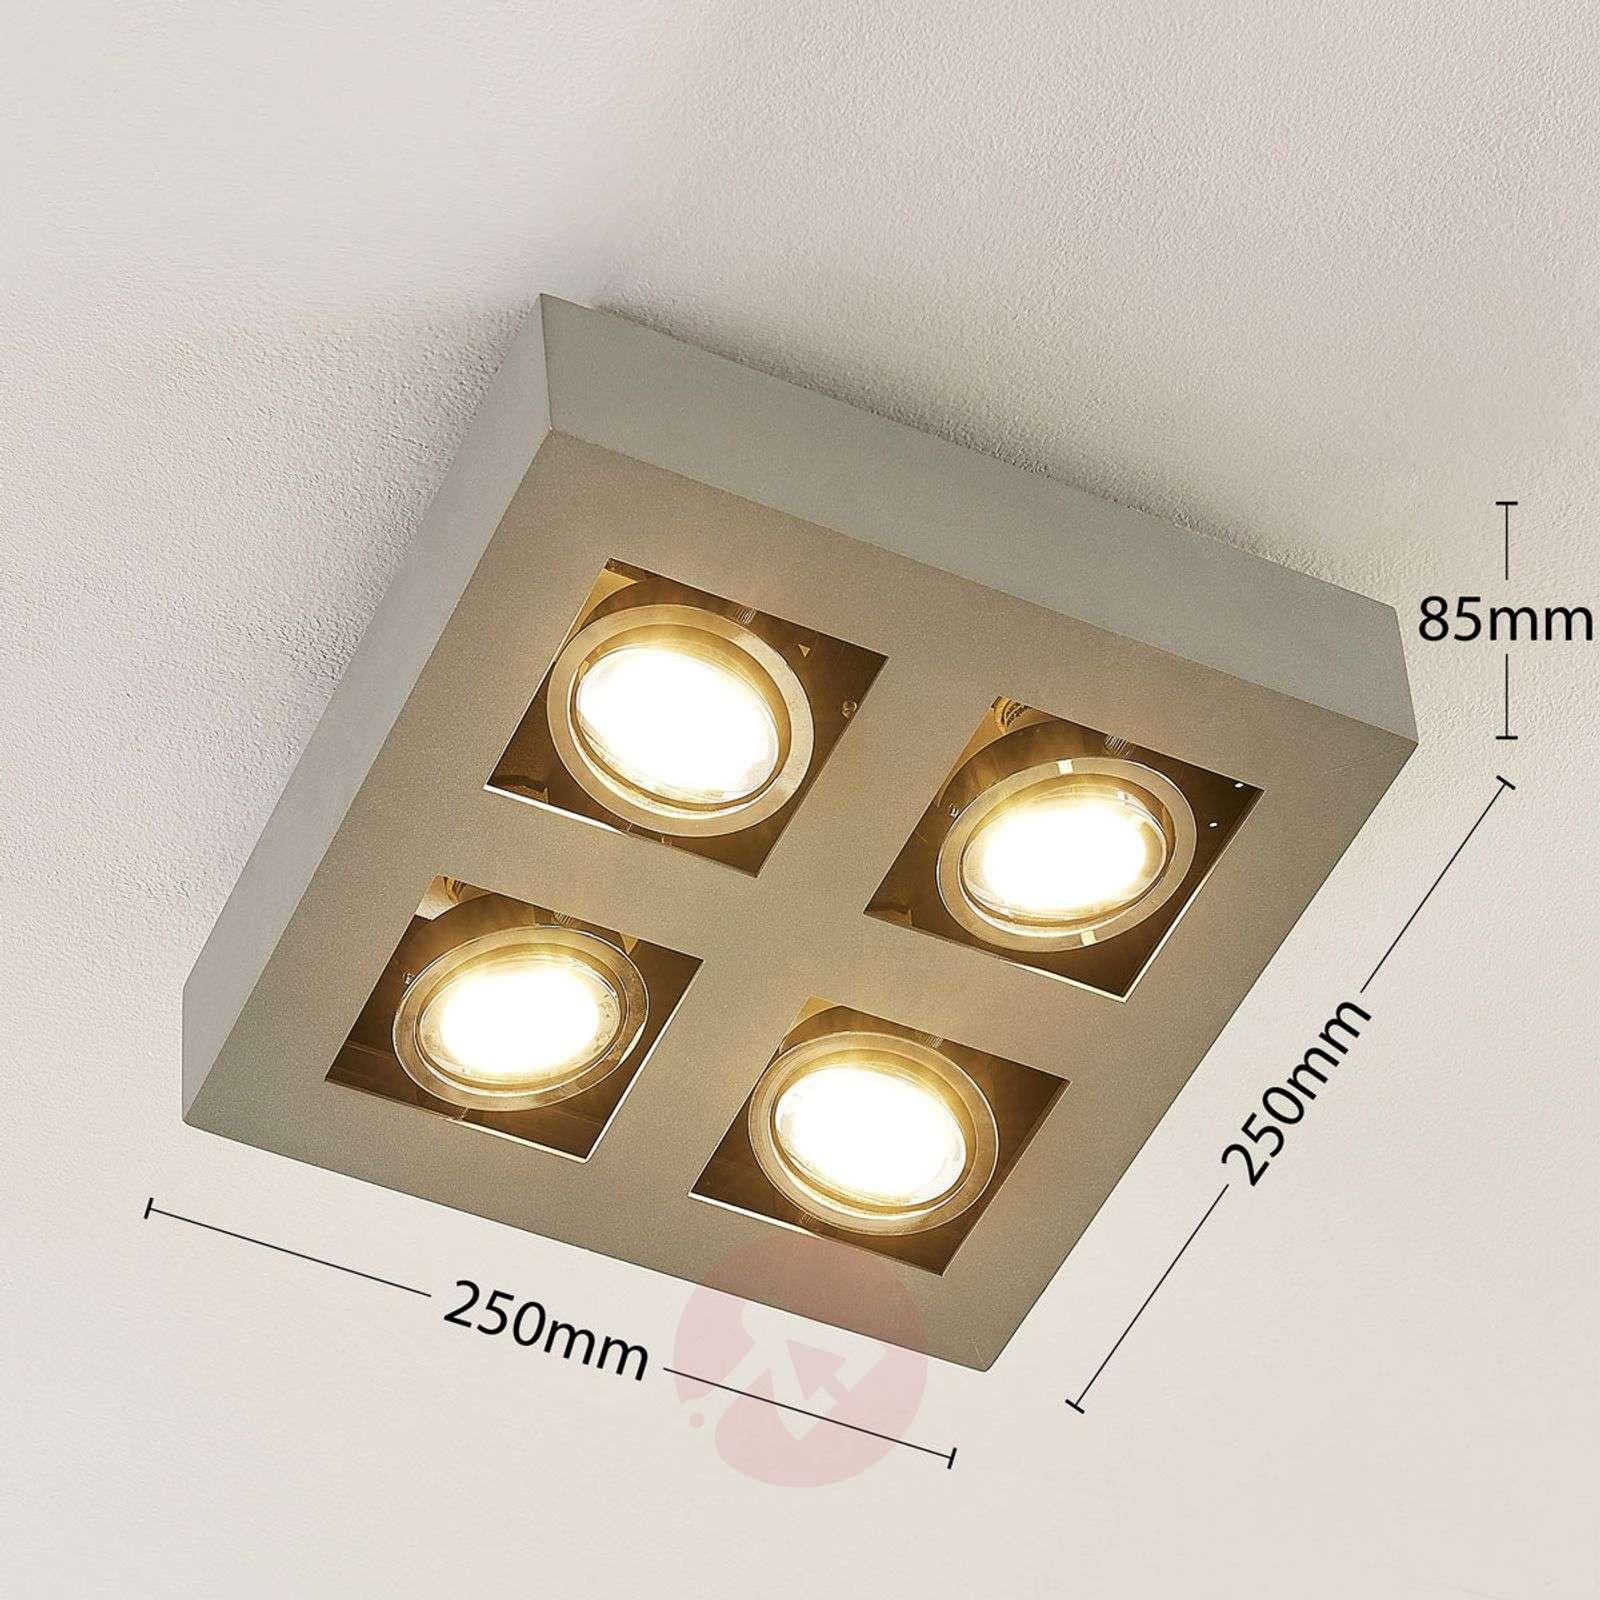 GU10-kohdevalaisin Vince LED-lampuilla-9620076-02